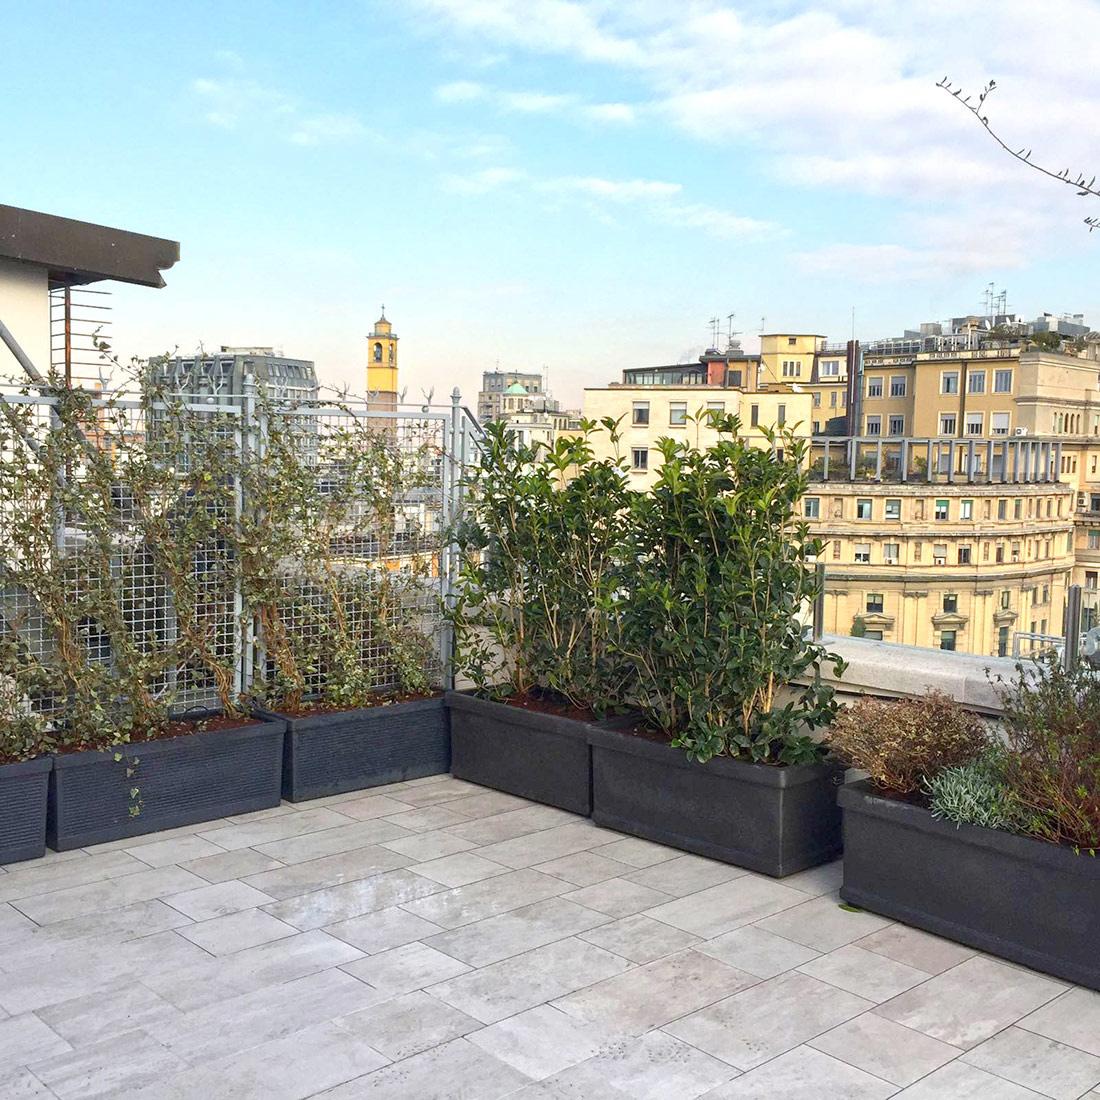 Giardino pensile milano bs26 regardsdefemmes - Terrazzo giardino ...